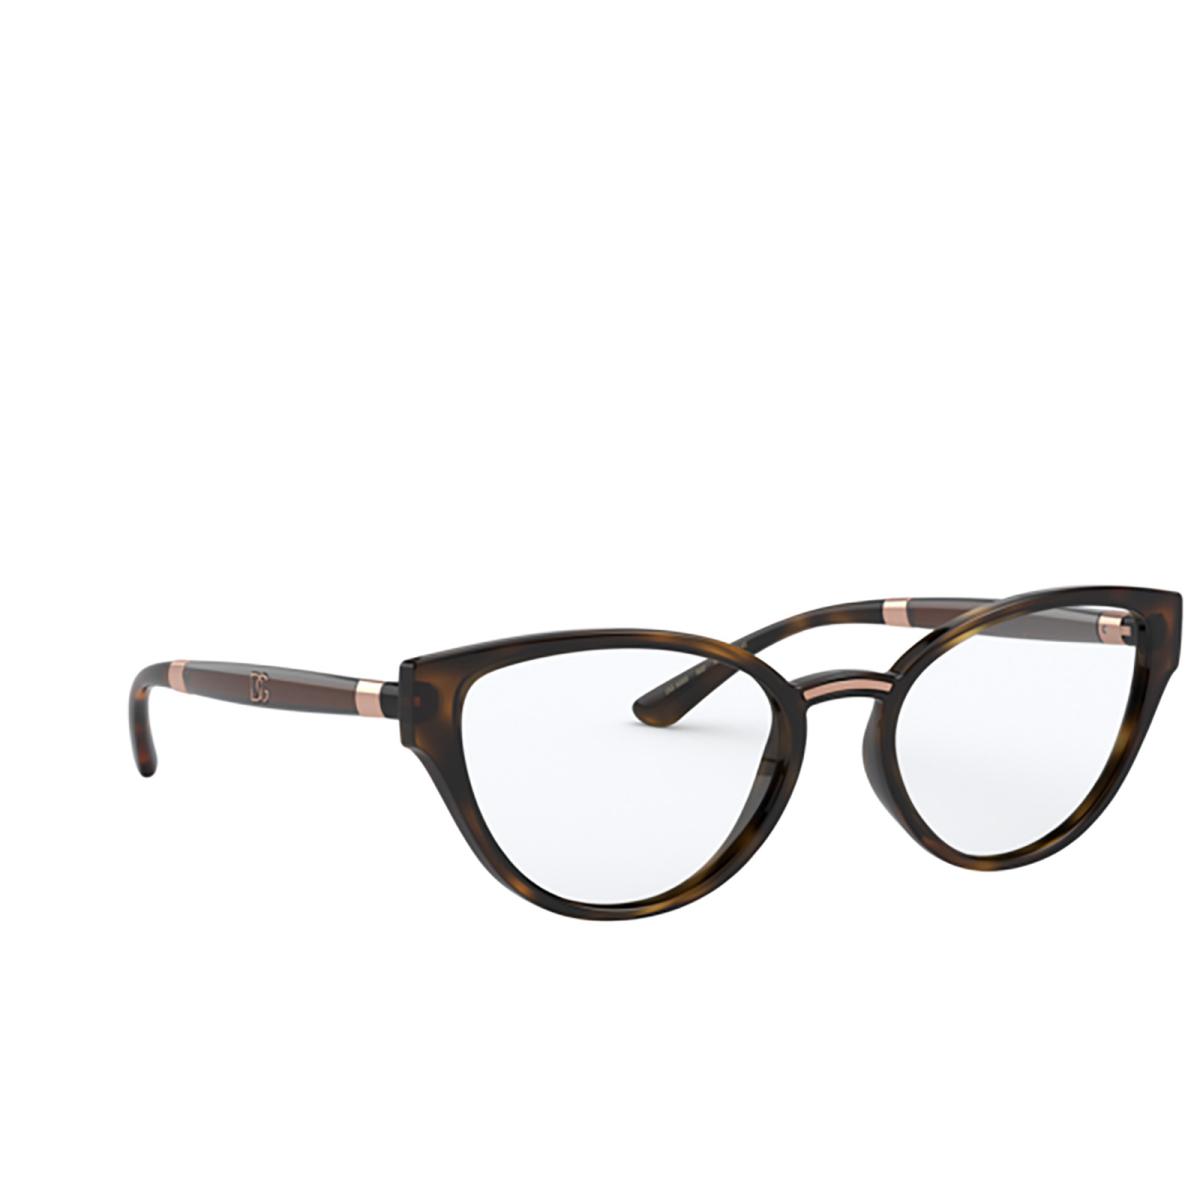 Dolce & Gabbana® Cat-eye Eyeglasses: DG5055 color Havana 502.